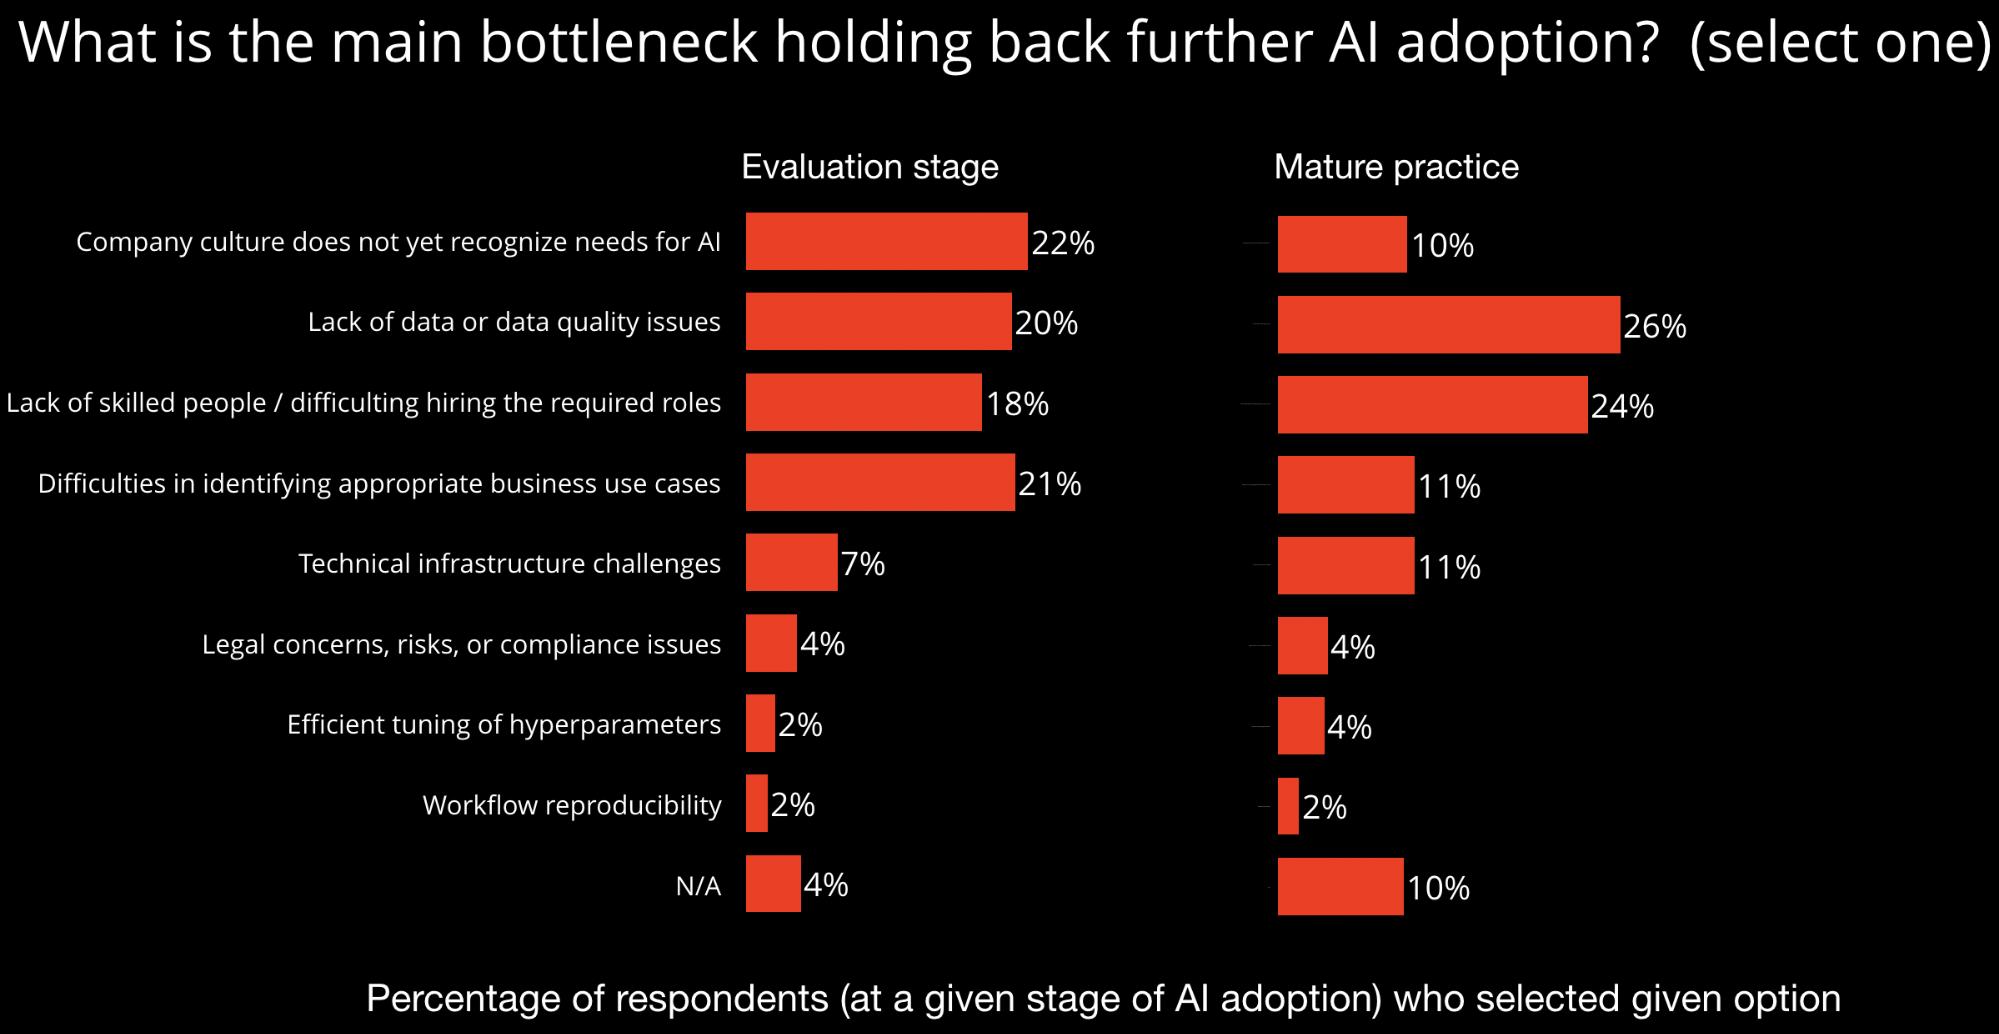 data bottleneck holding back further adoption of AI technologies